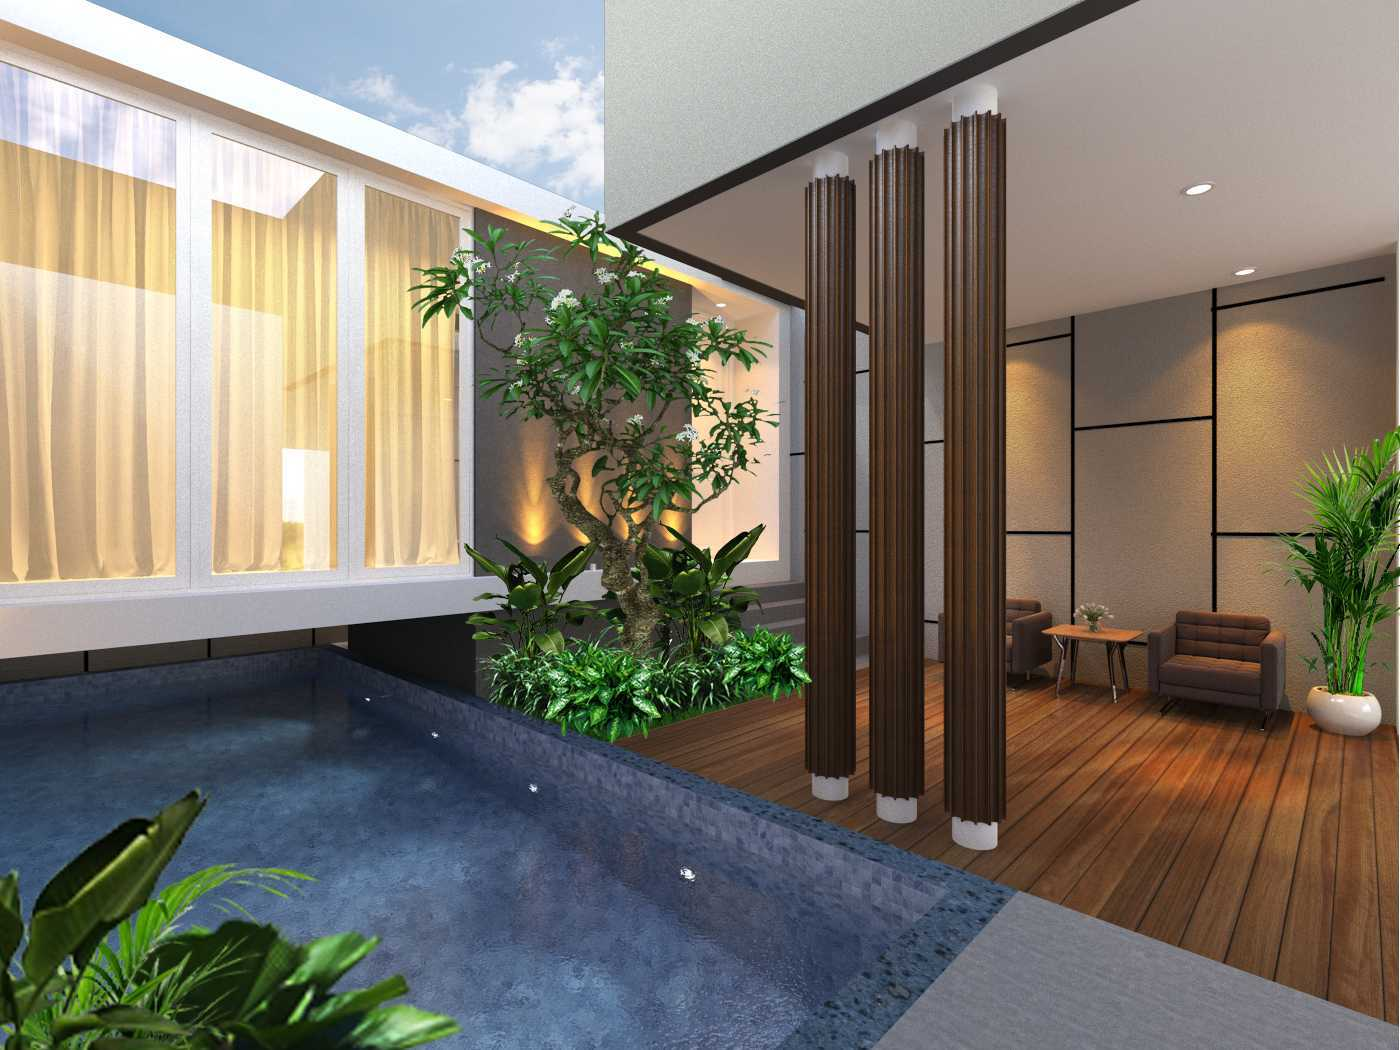 Sense Studio Rumah Tinggal - Kertomenanggal Surabaya, Kota Sby, Jawa Timur, Indonesia Surabaya, Kota Sby, Jawa Timur, Indonesia Sense-Studio-Rumah-Tinggal-Kertomenanggal   51655